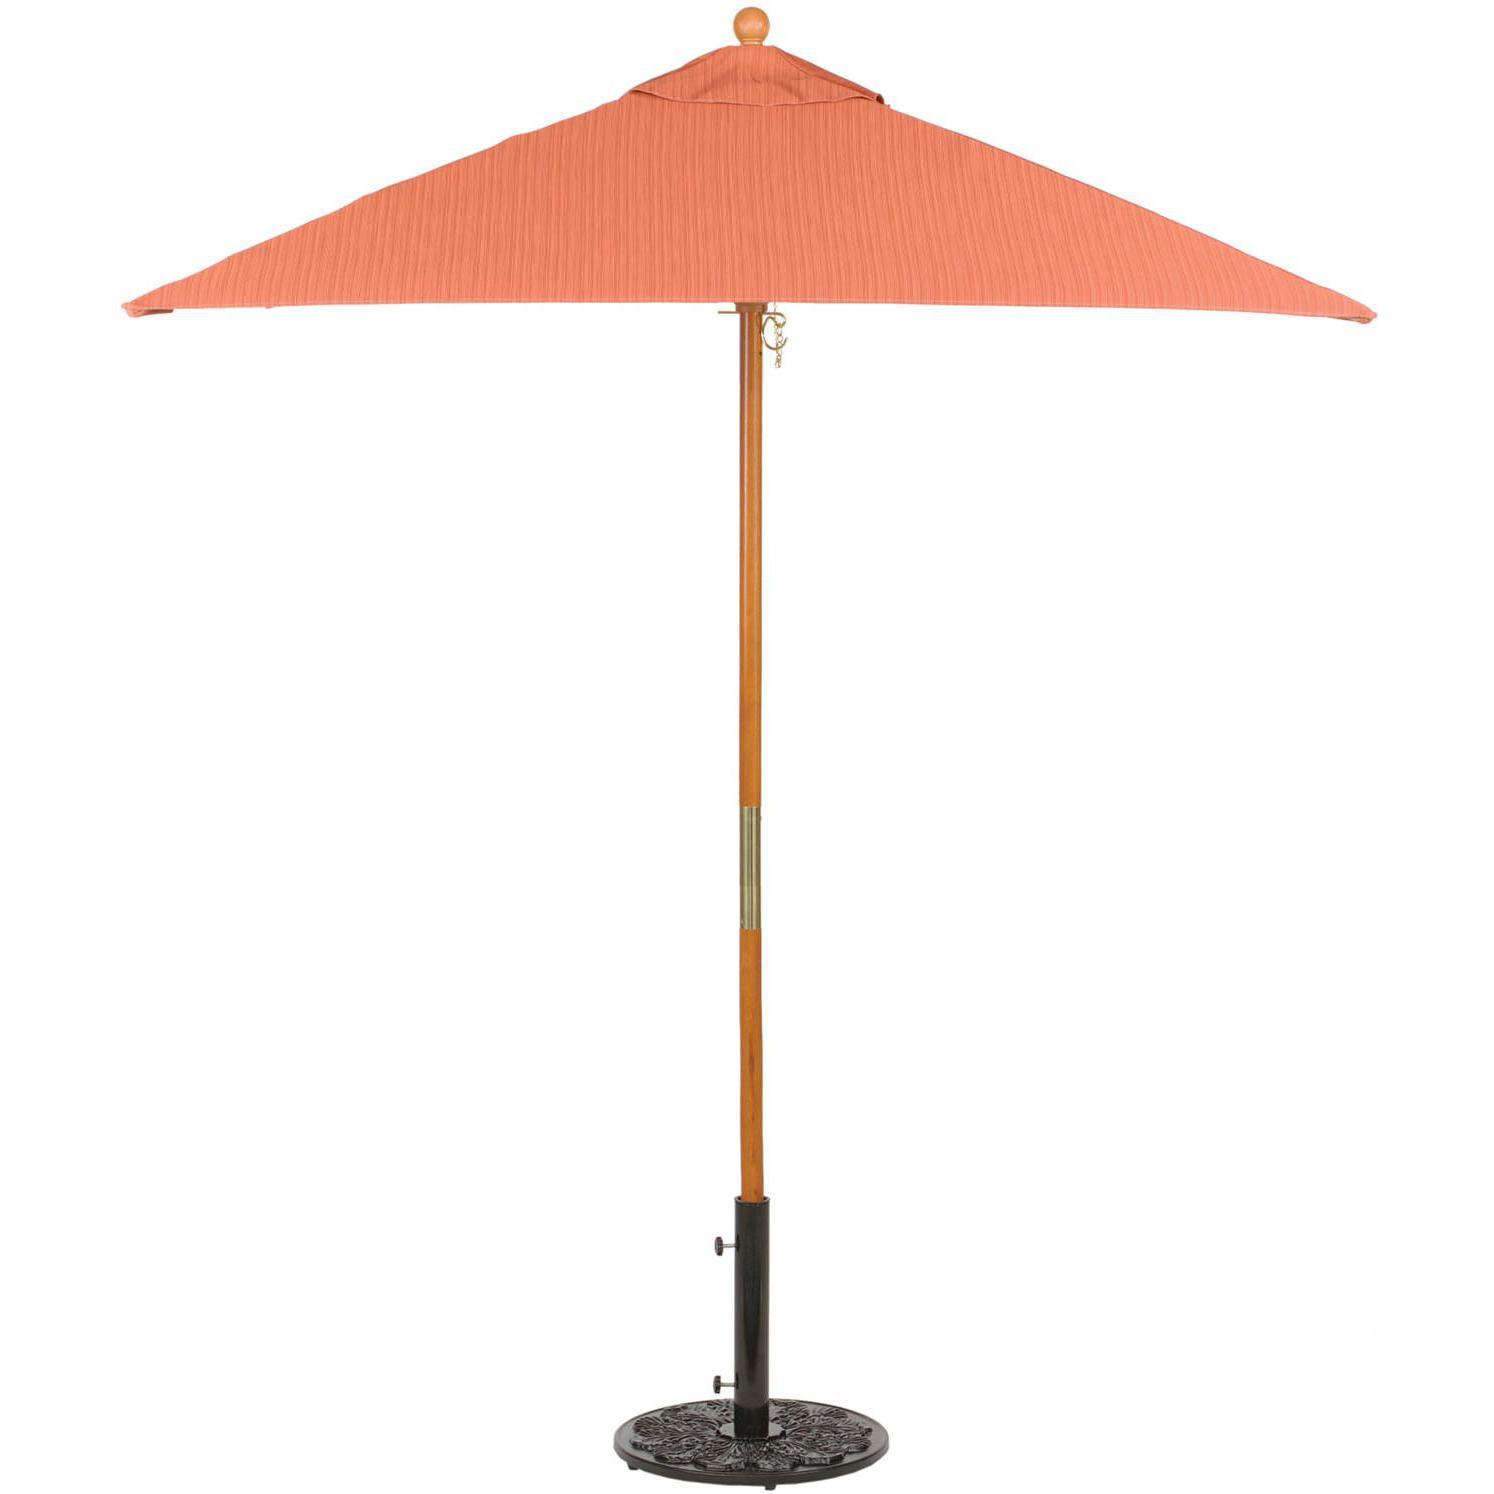 Oxford Garden 6 Ft. Square Wood Patio Market Umbrella - Dupione Papaya